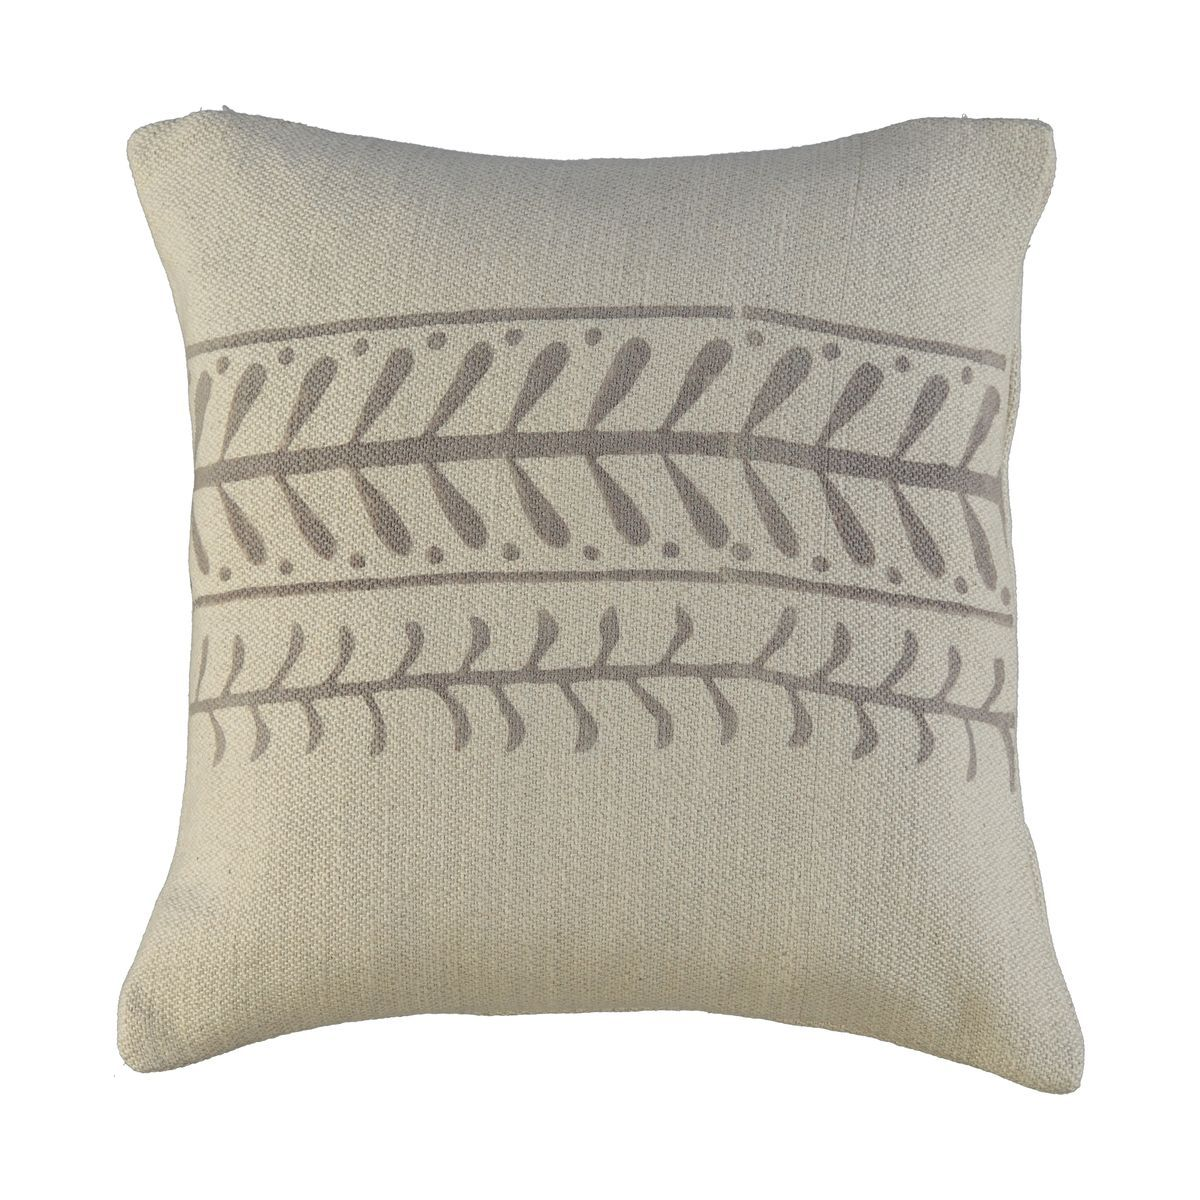 Cushion Cover / 15 Hand Printed - Beige